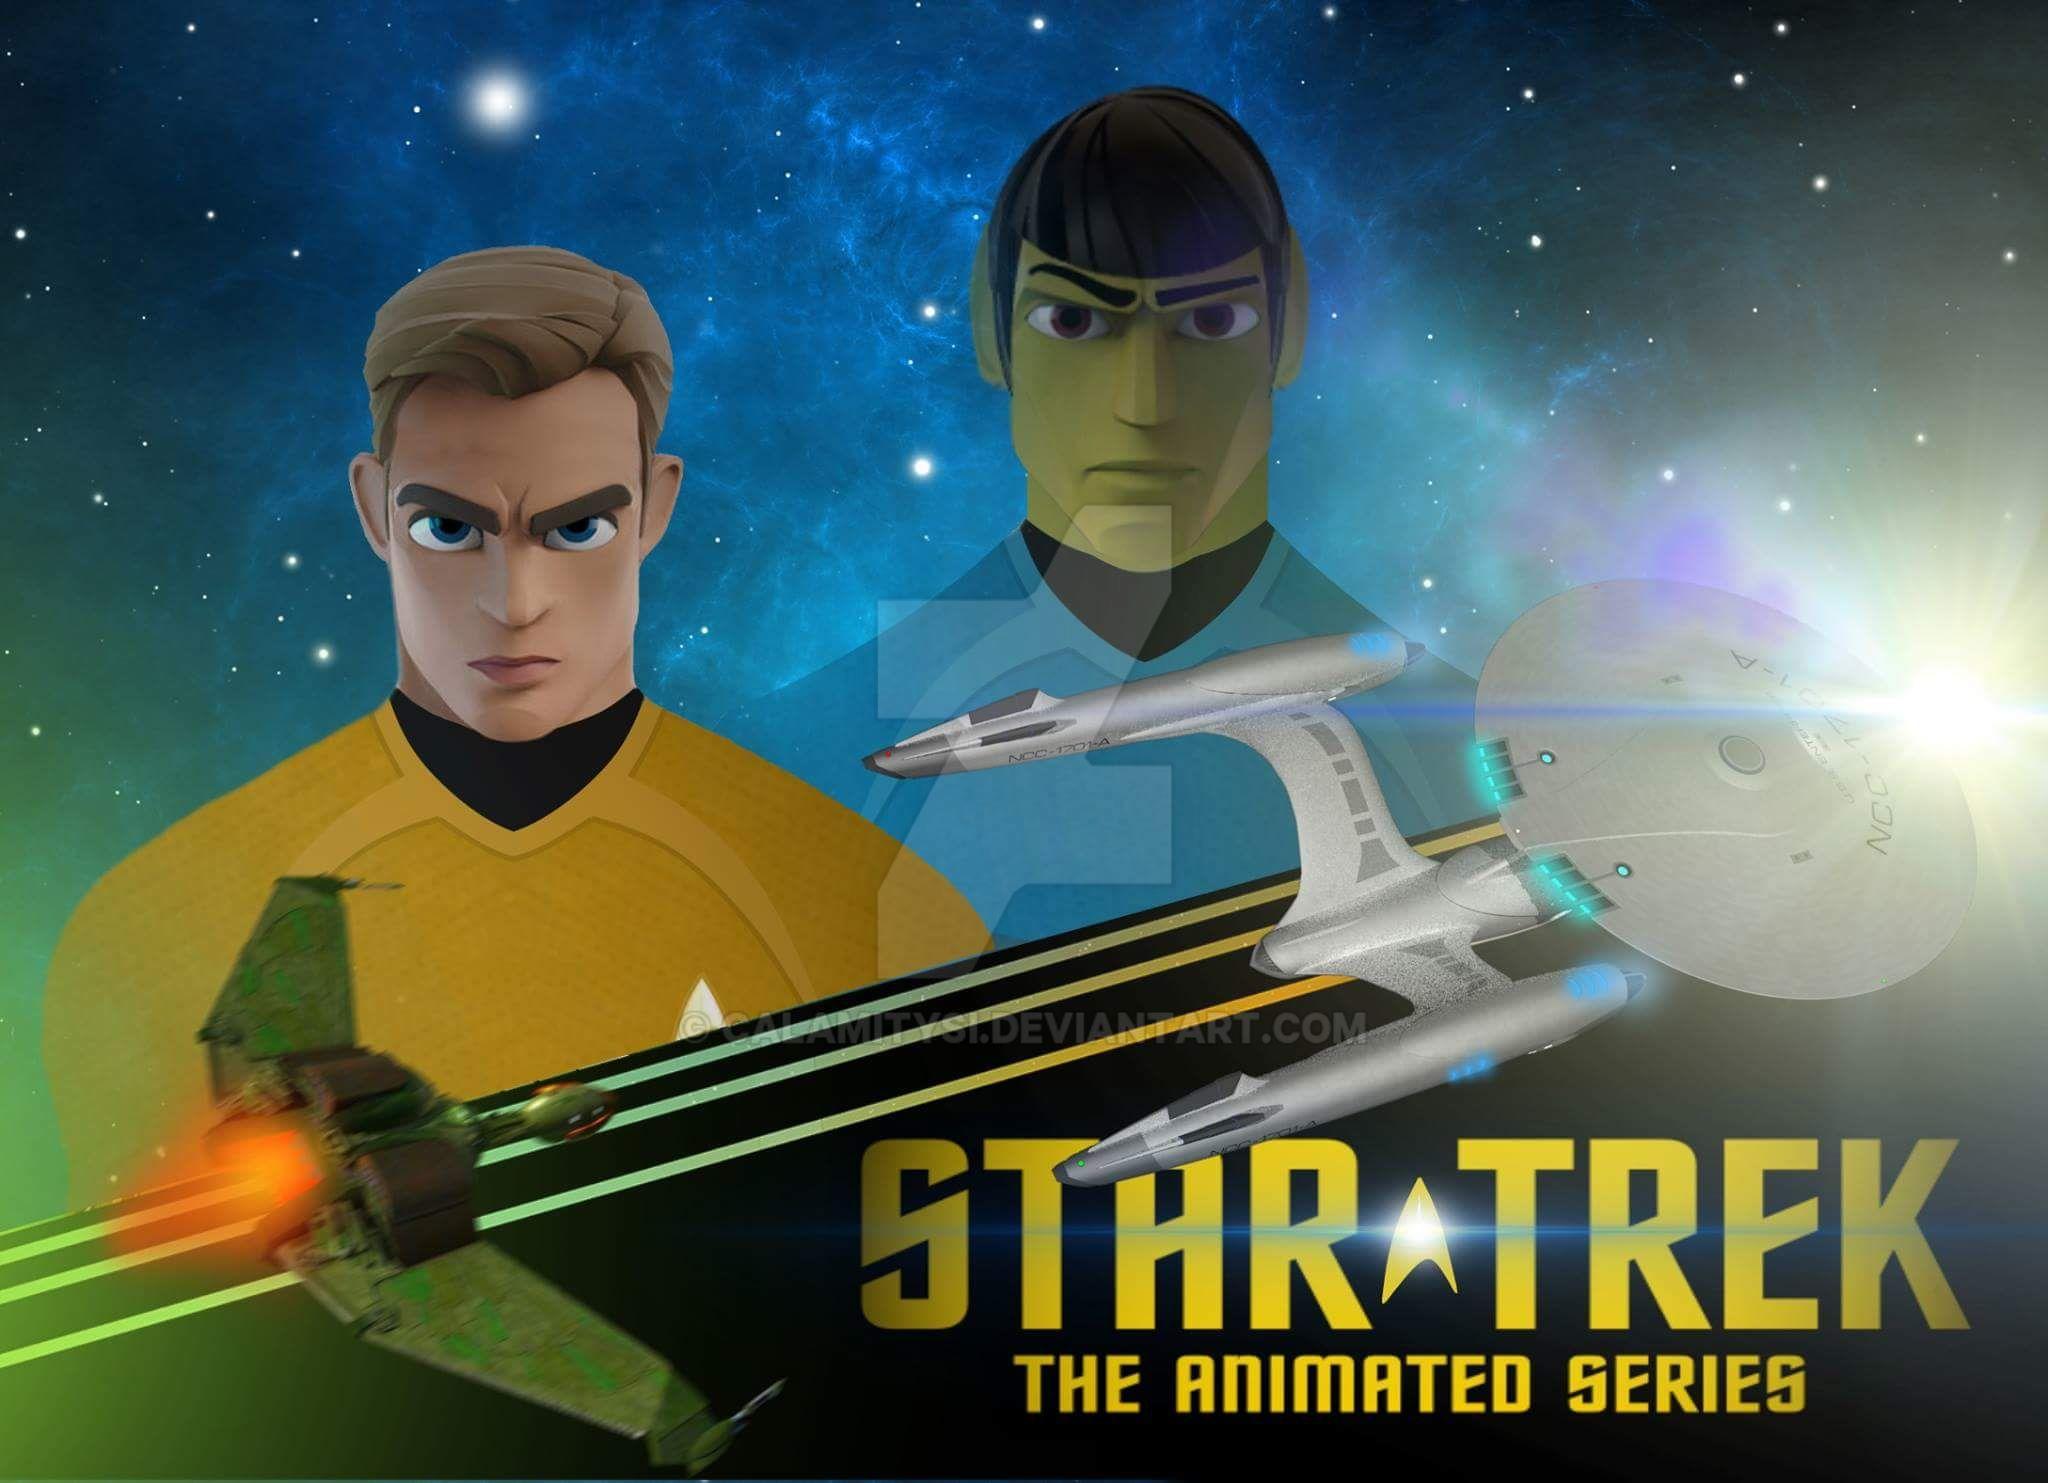 Star Trek: The Animated series by calamitySi